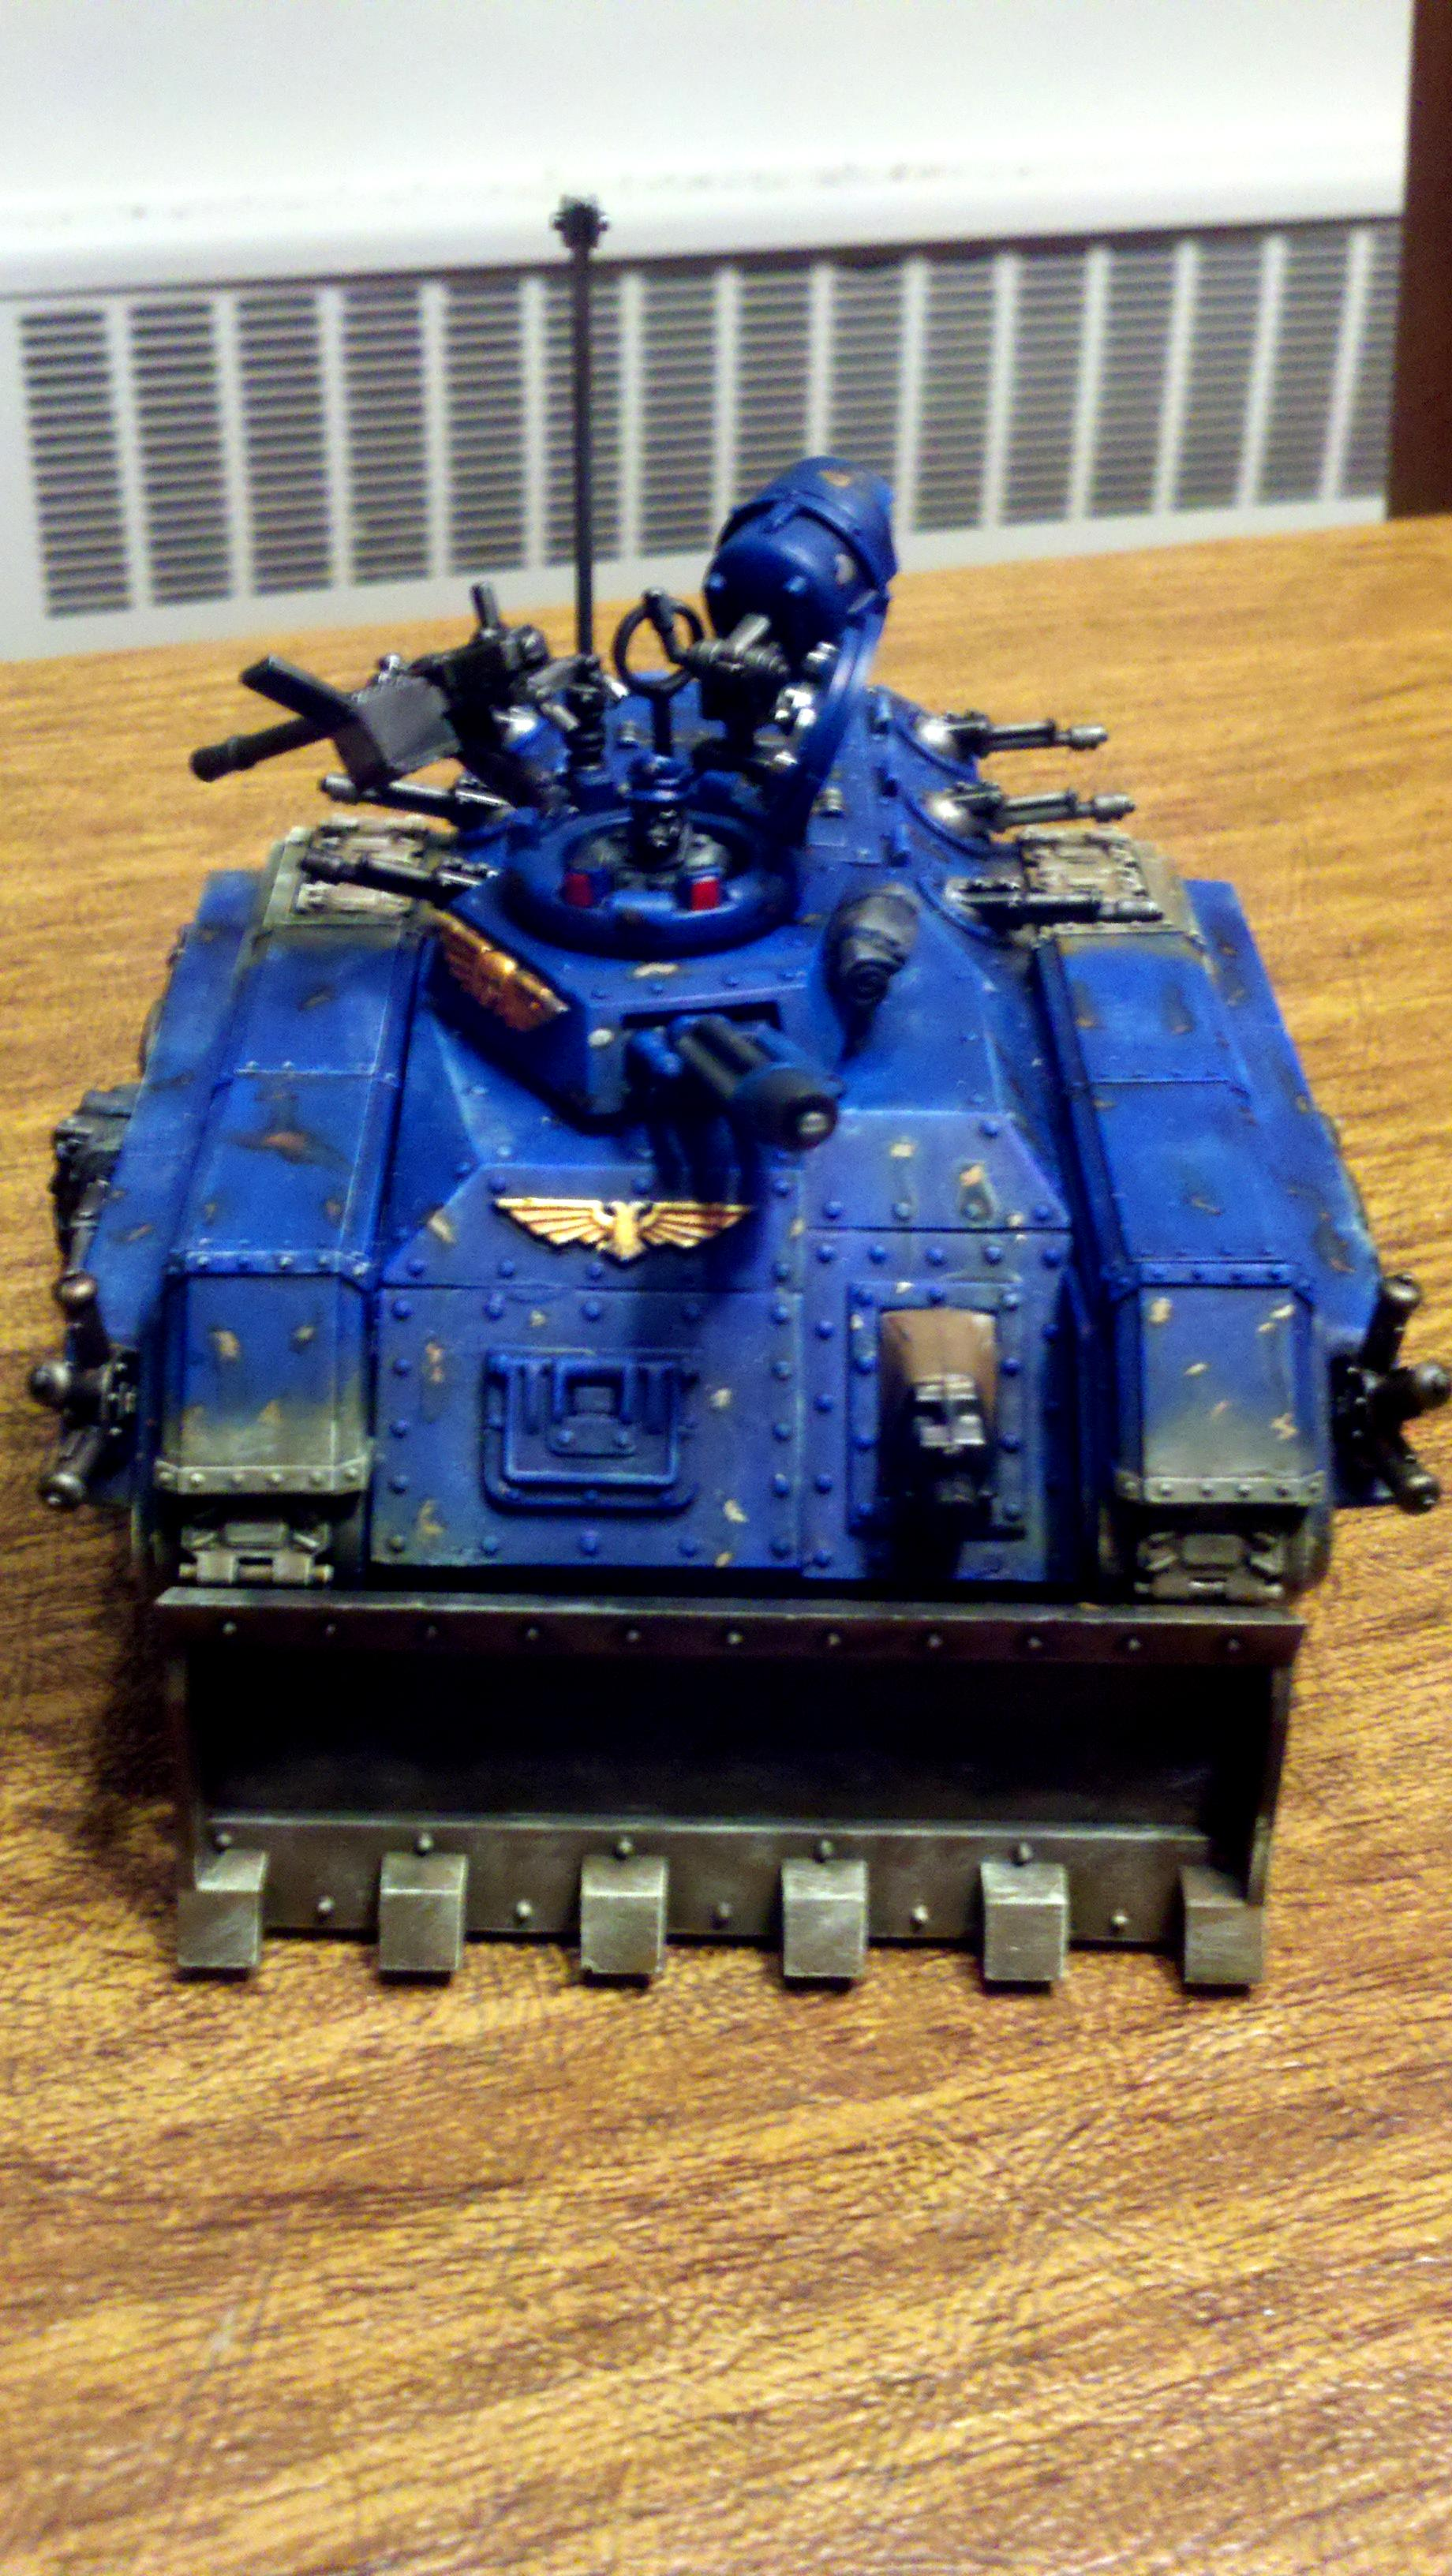 Chimera, Imperial Guard, Warhammer 40,000